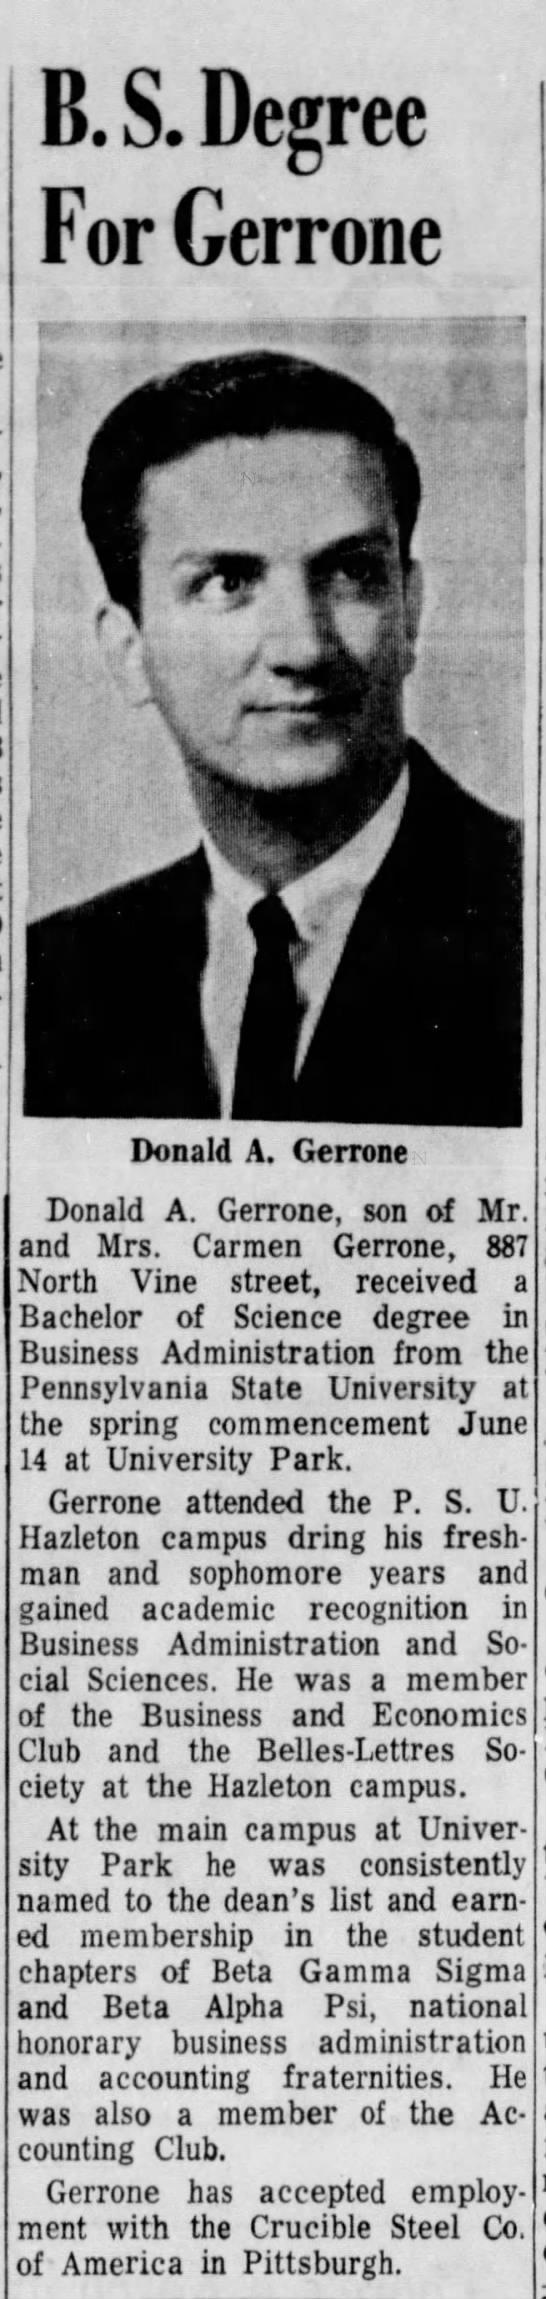 .B.S. Degree for Gerrone - B. S. Degree For Gerrone dfJ Donald A. Gerrone...